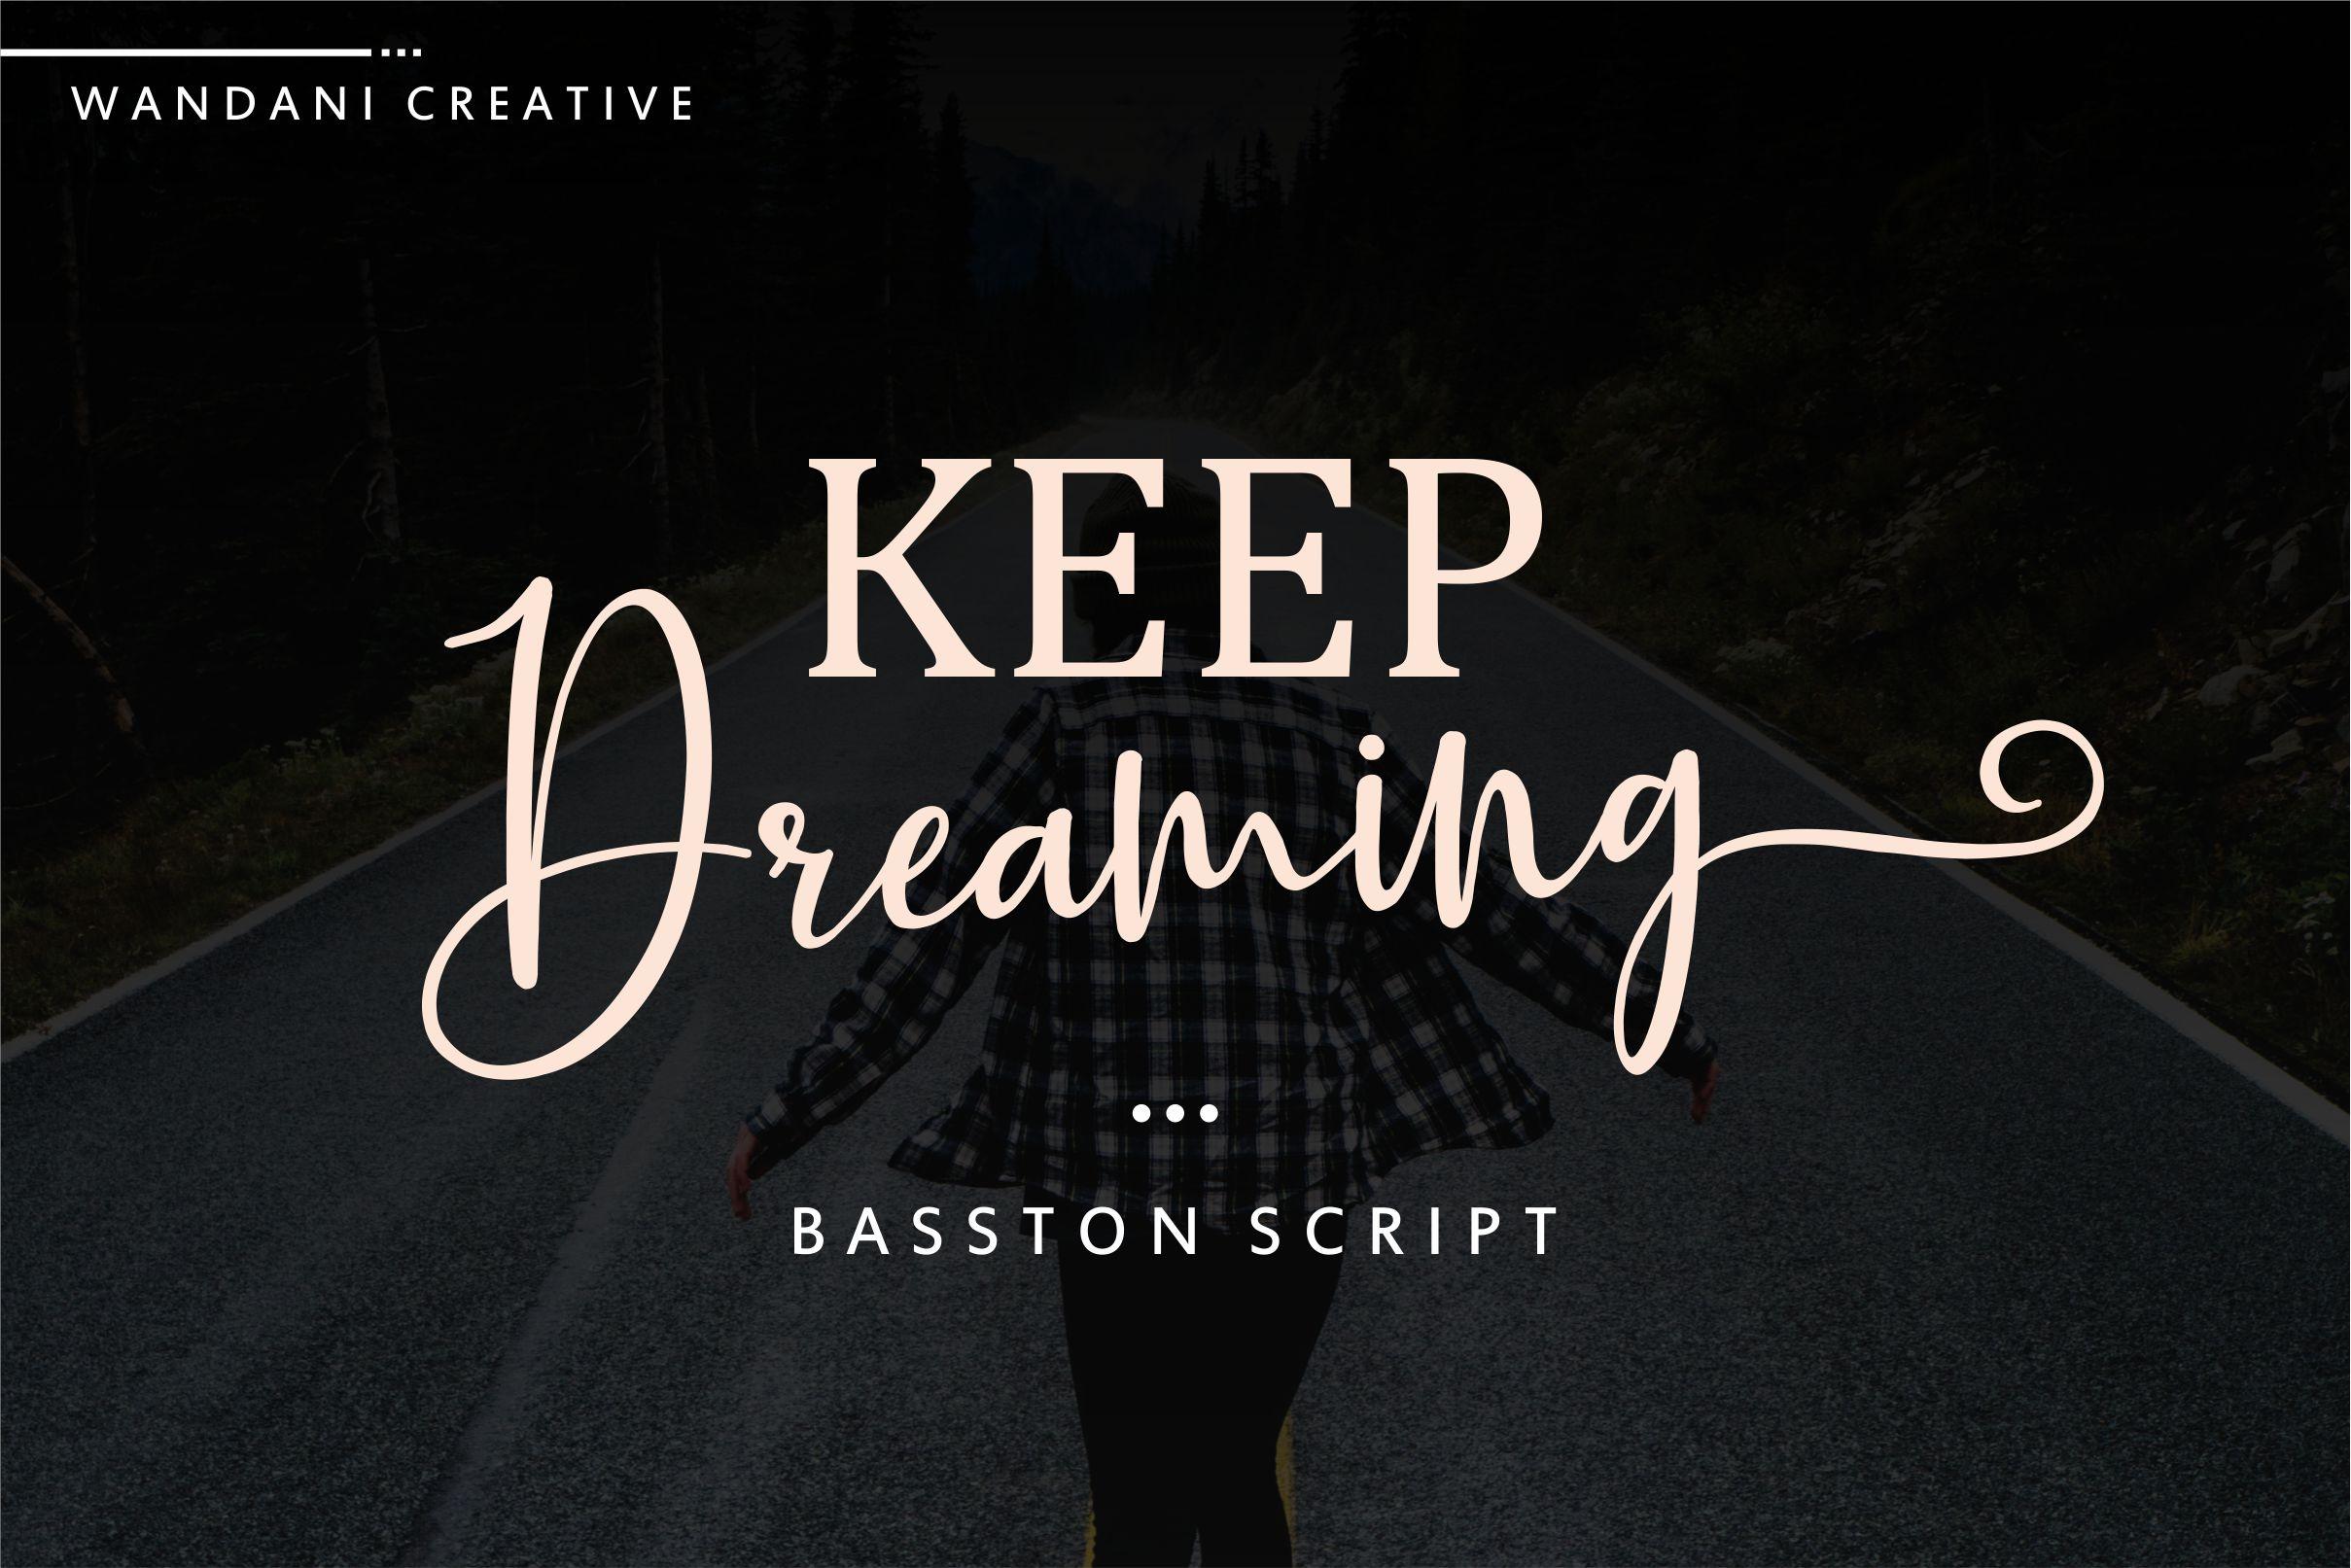 Basston Script example image 2